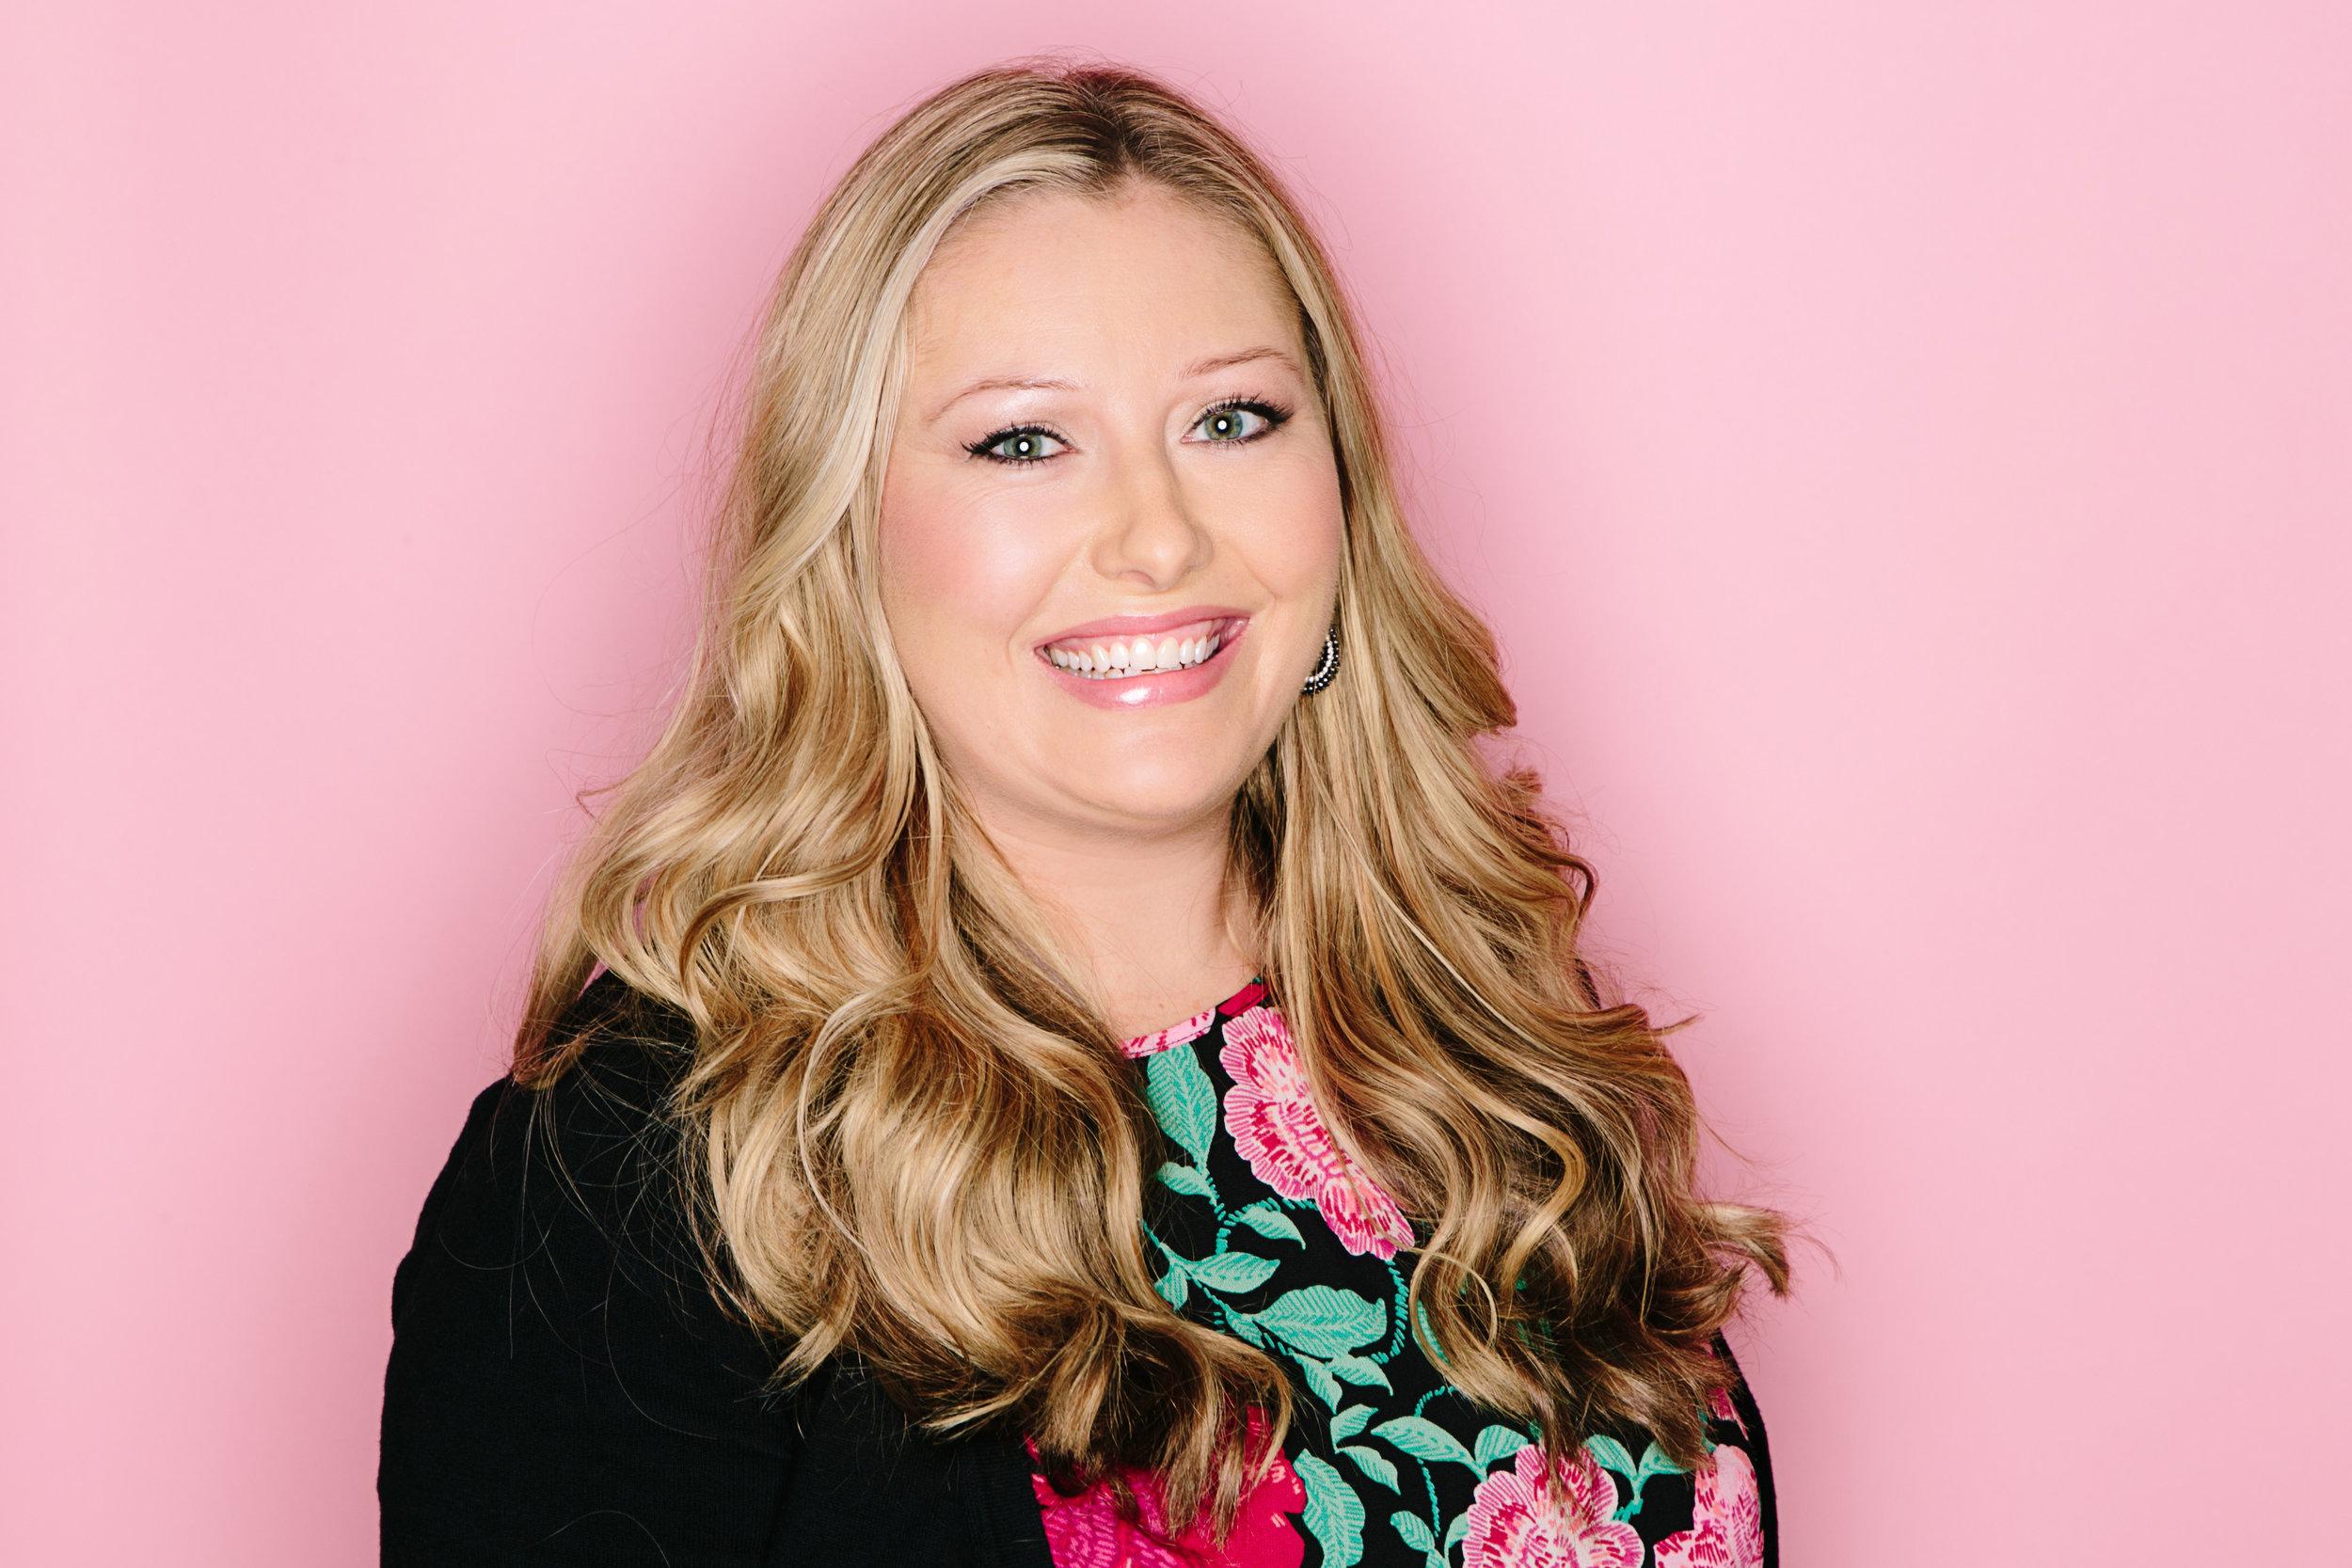 Owner and Professional Makeup Artist, Kim Porter